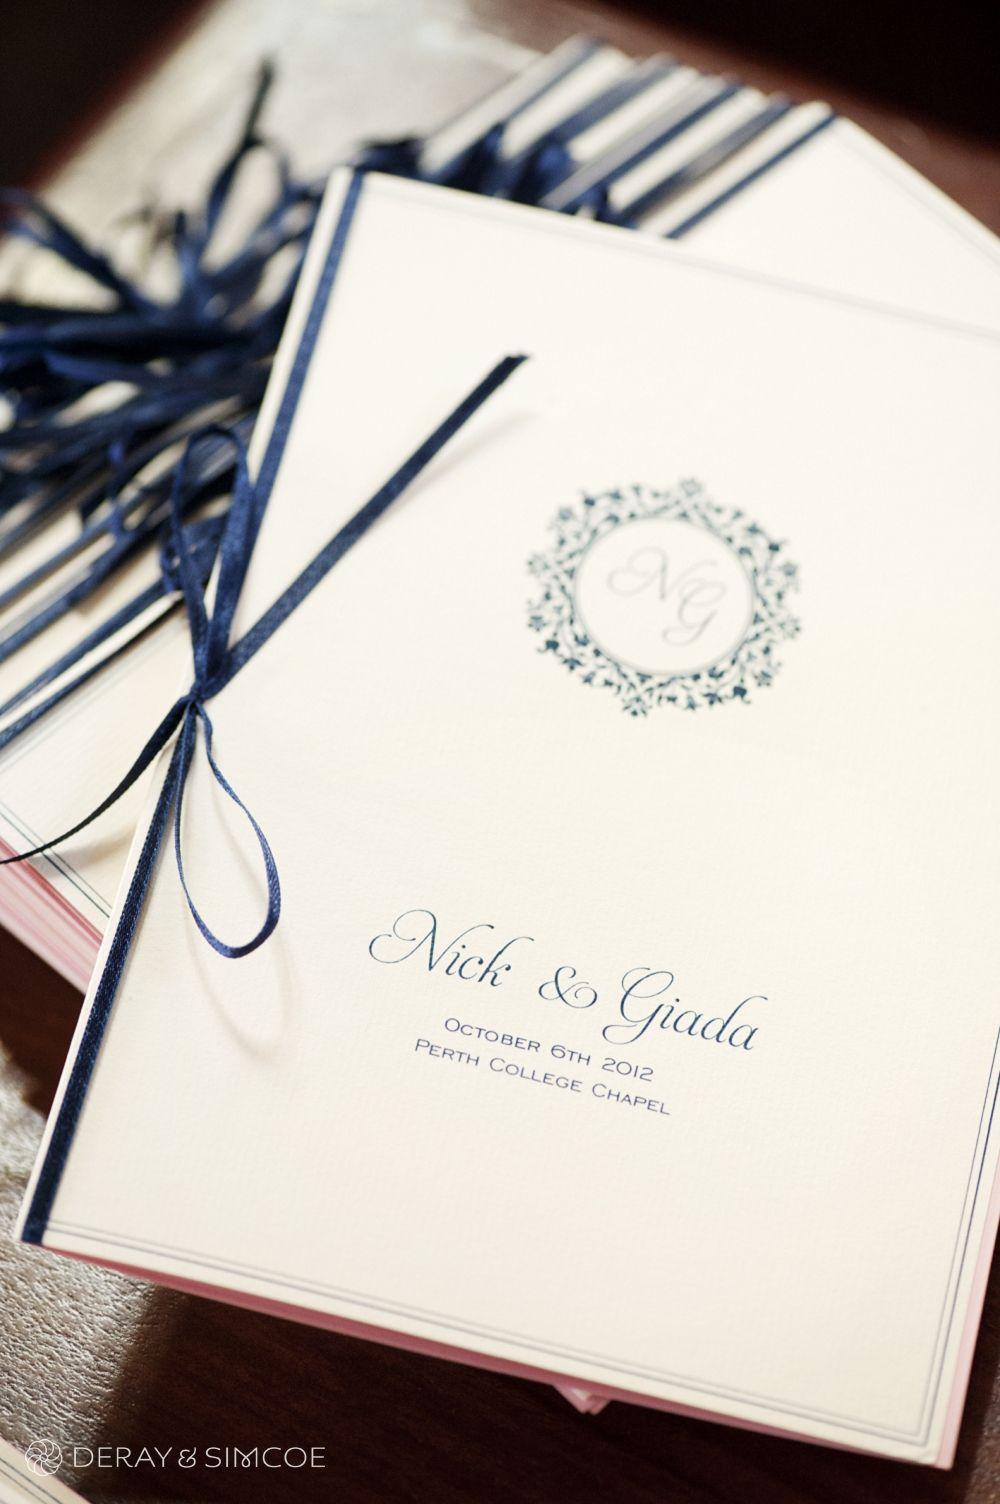 024 Navy Custom Song Booklet Ribbon Church Ceremony Perth College Chapel Uwa Club Wedding Photography